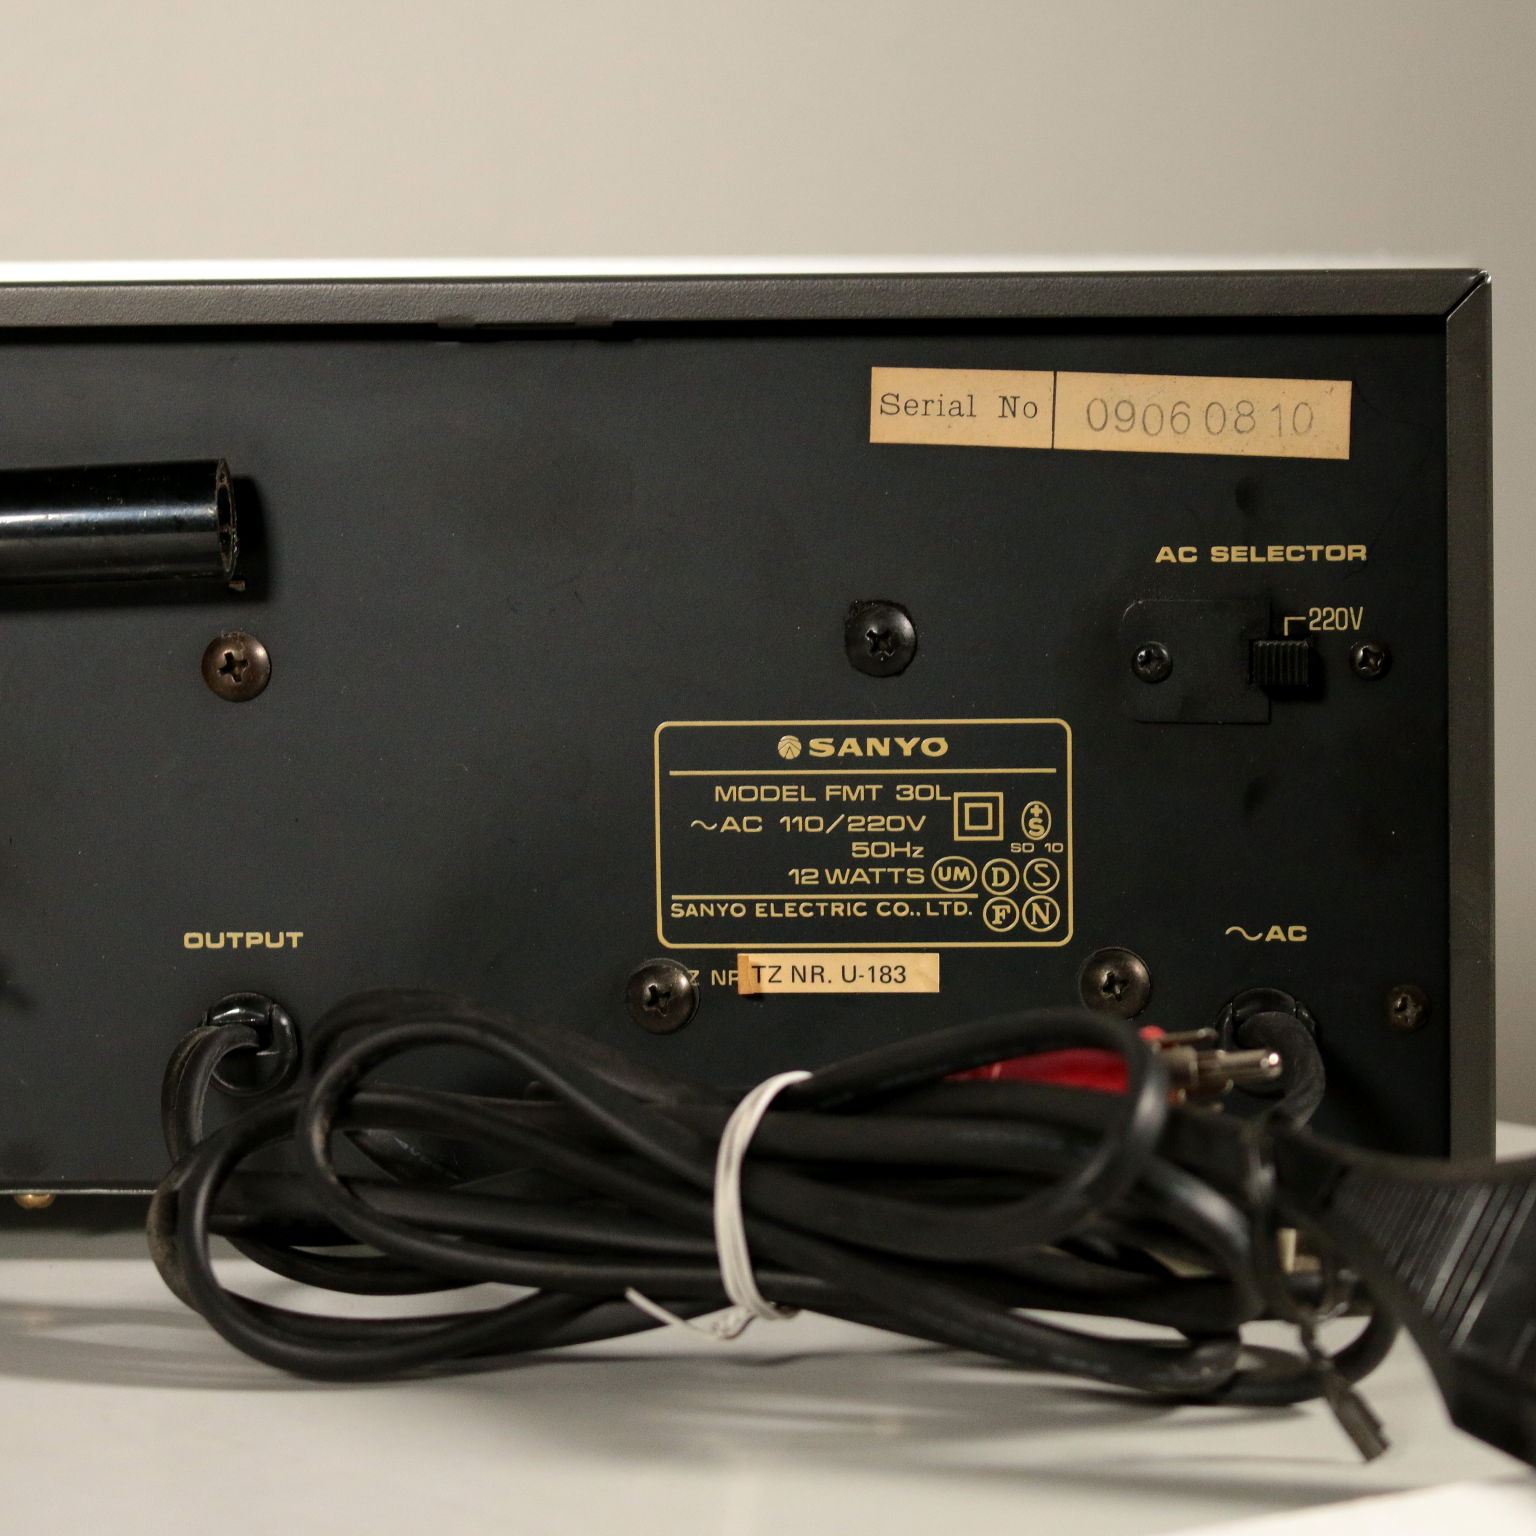 Sanyo Hi-Fi System Vintage Japan 1979 - Electronic - Modern